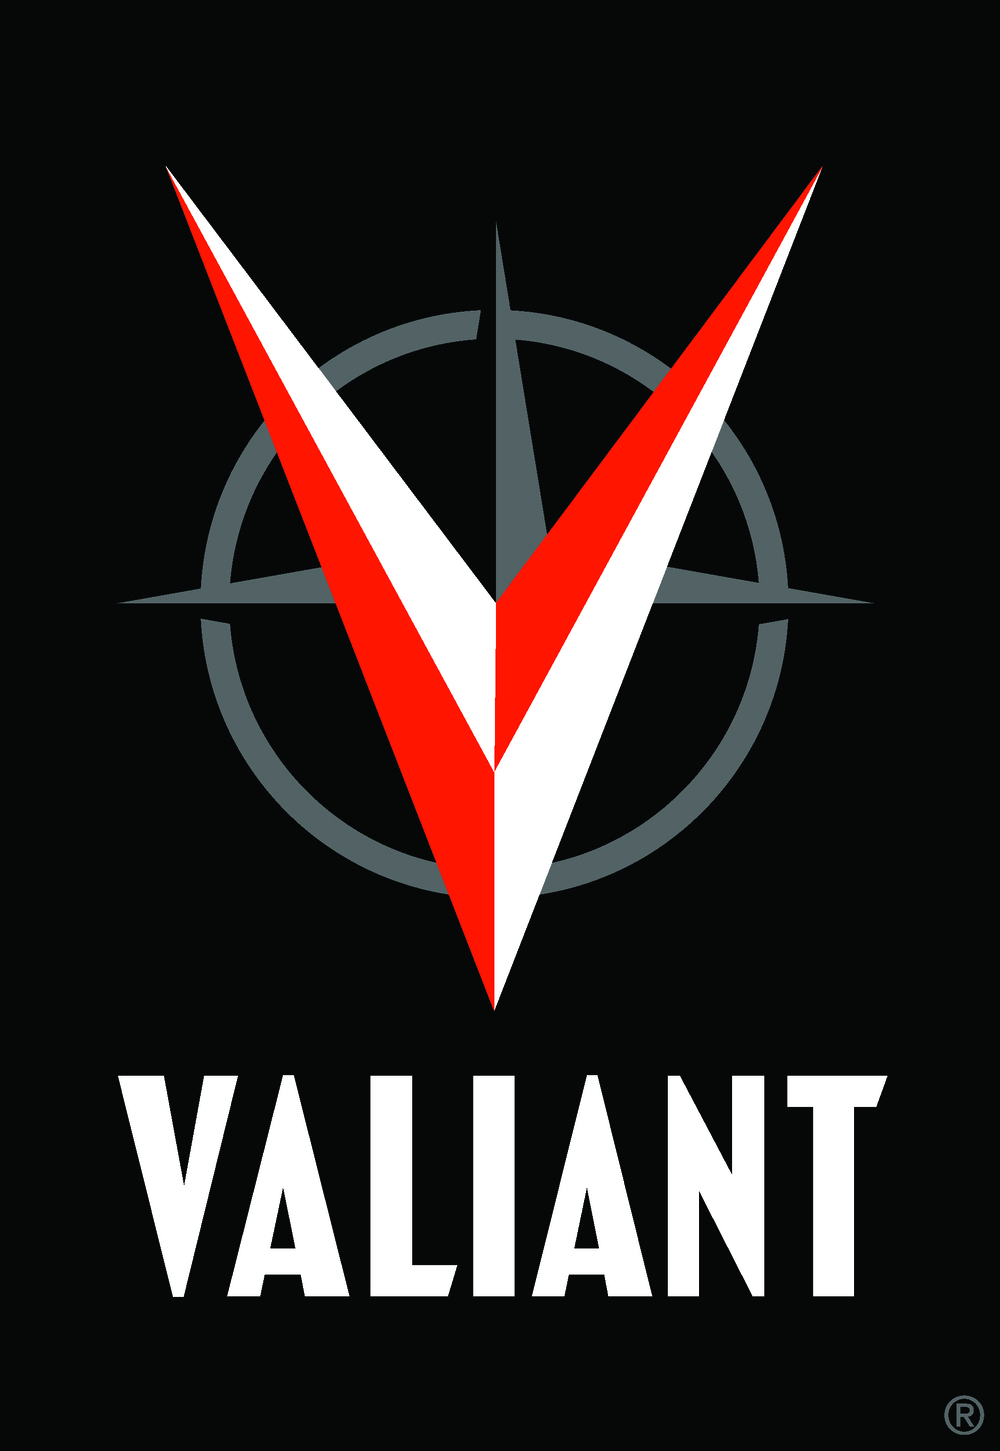 Valiant-logo-main-master.jpg